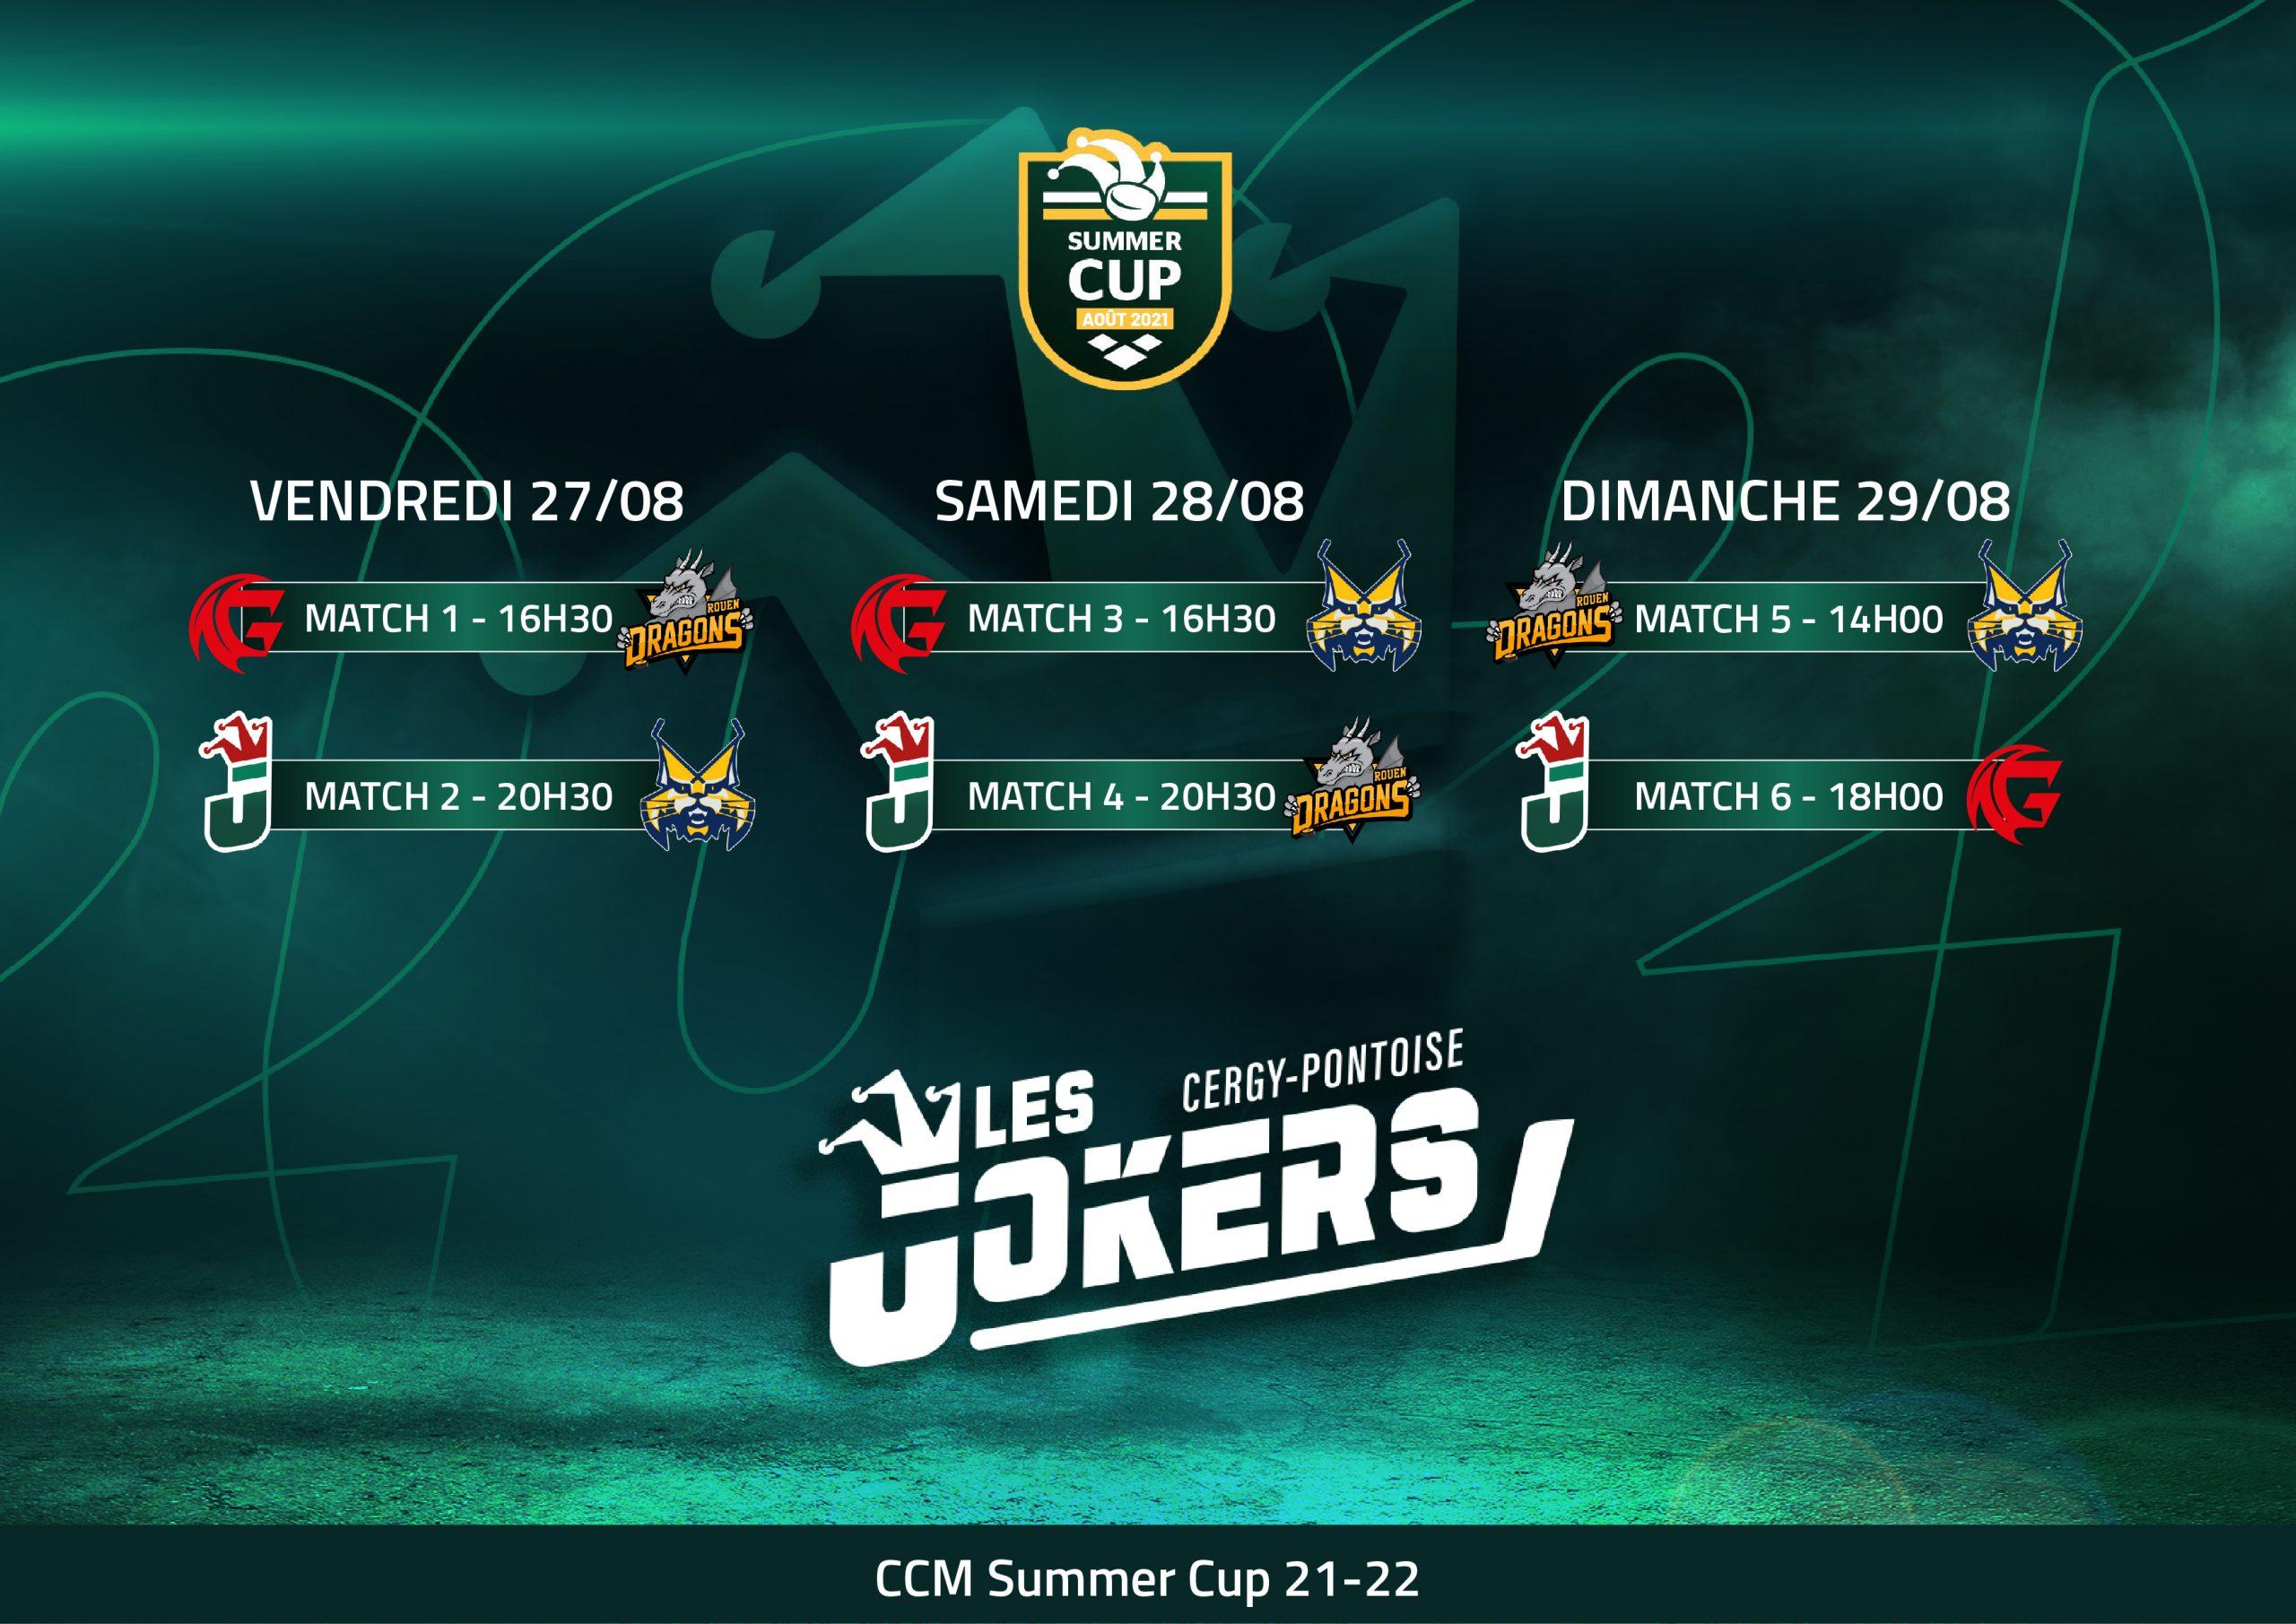 CCM Summer Cup